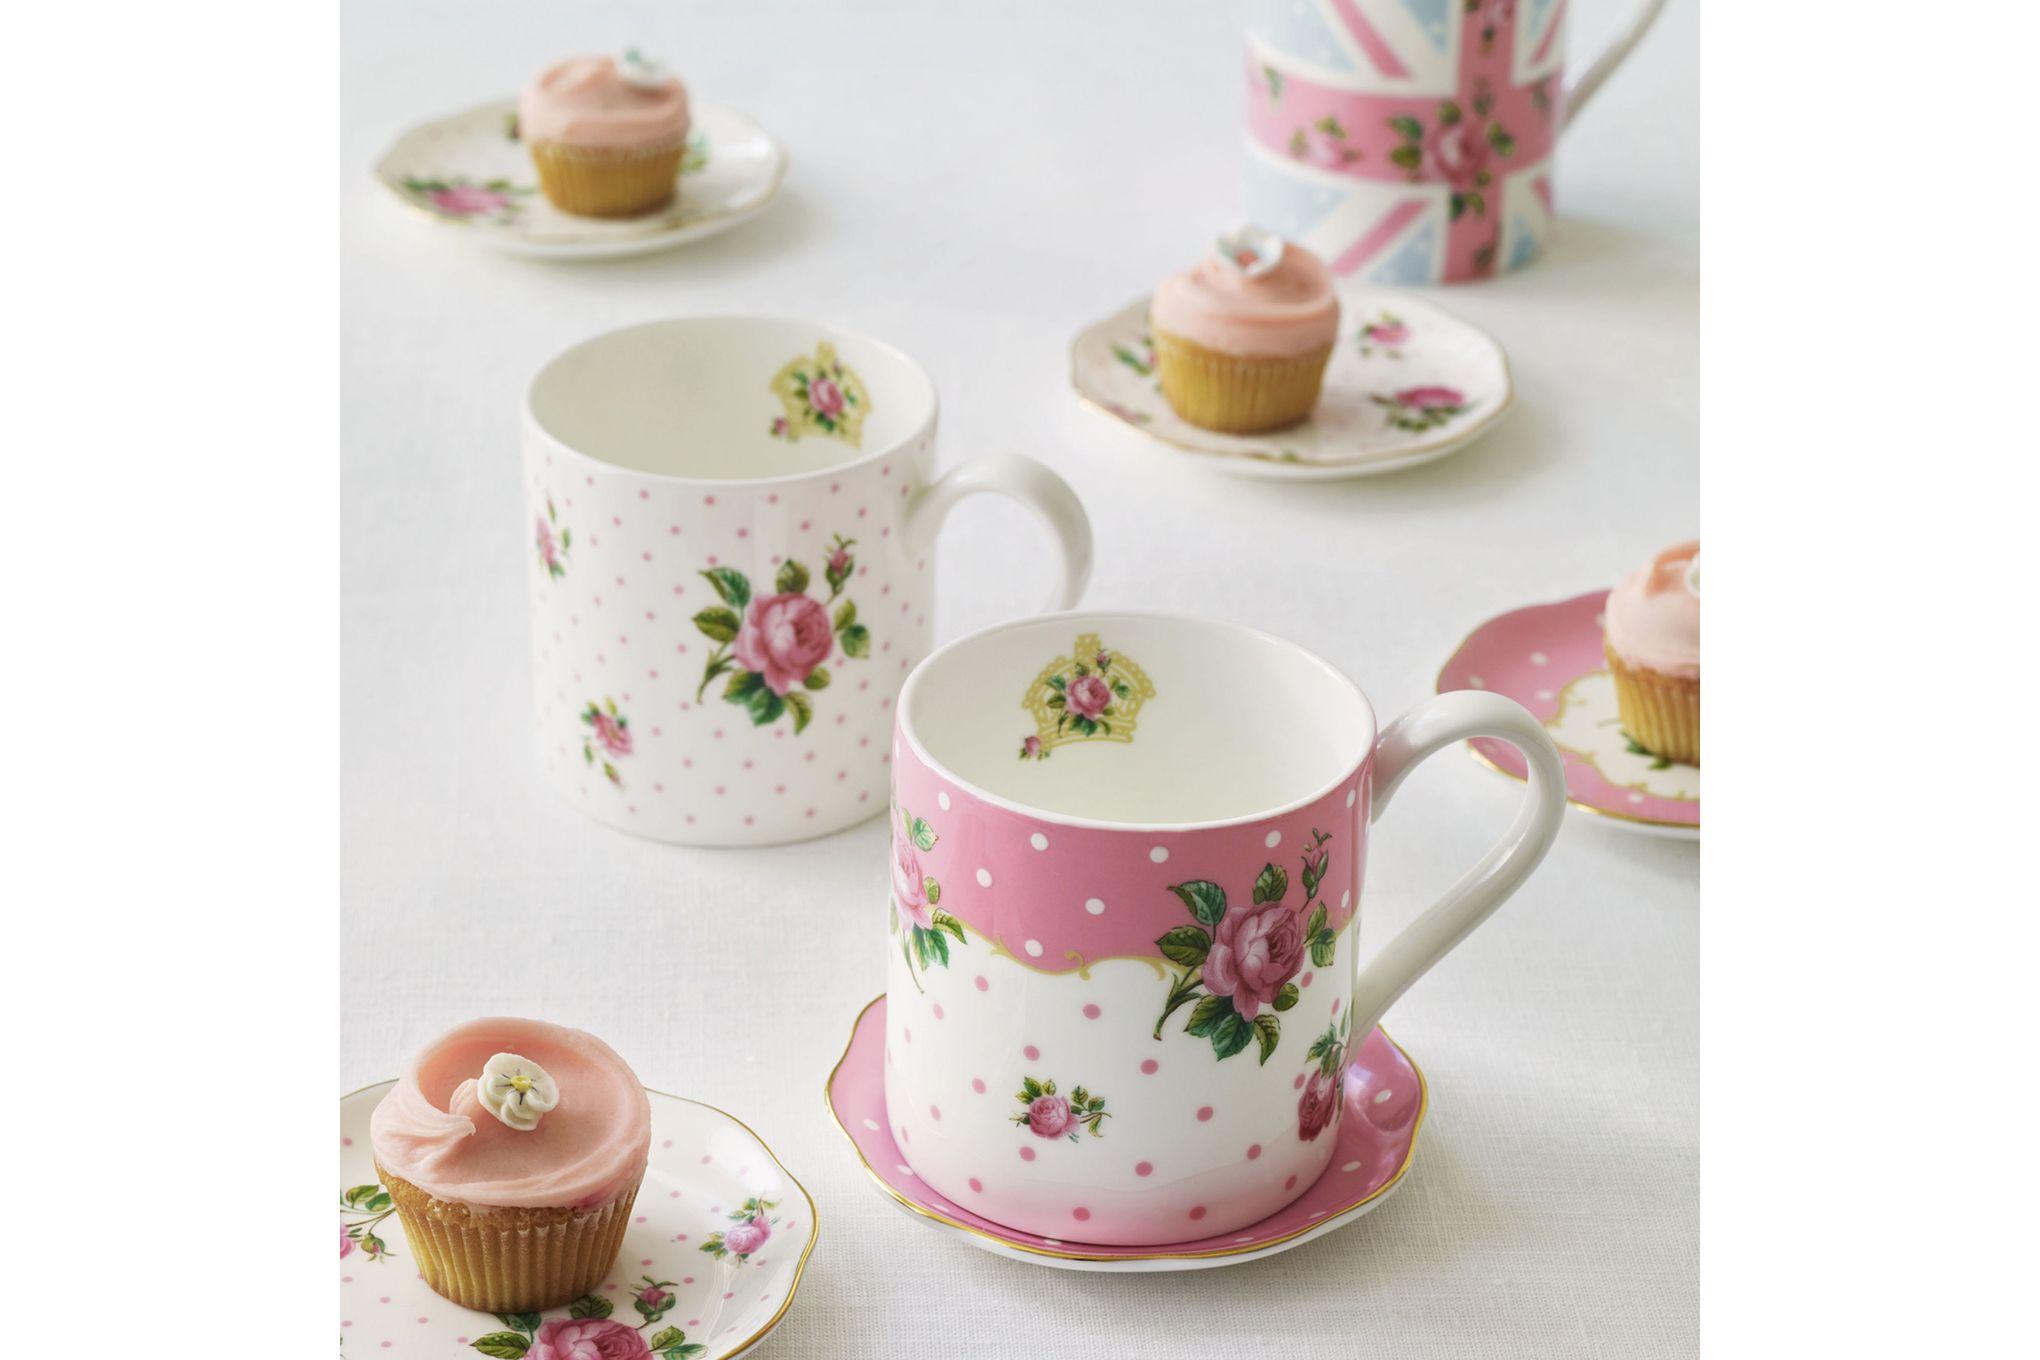 Royal Albert Cheeky Pink Mug Cheeky Pink - Modern Mug thumb 2